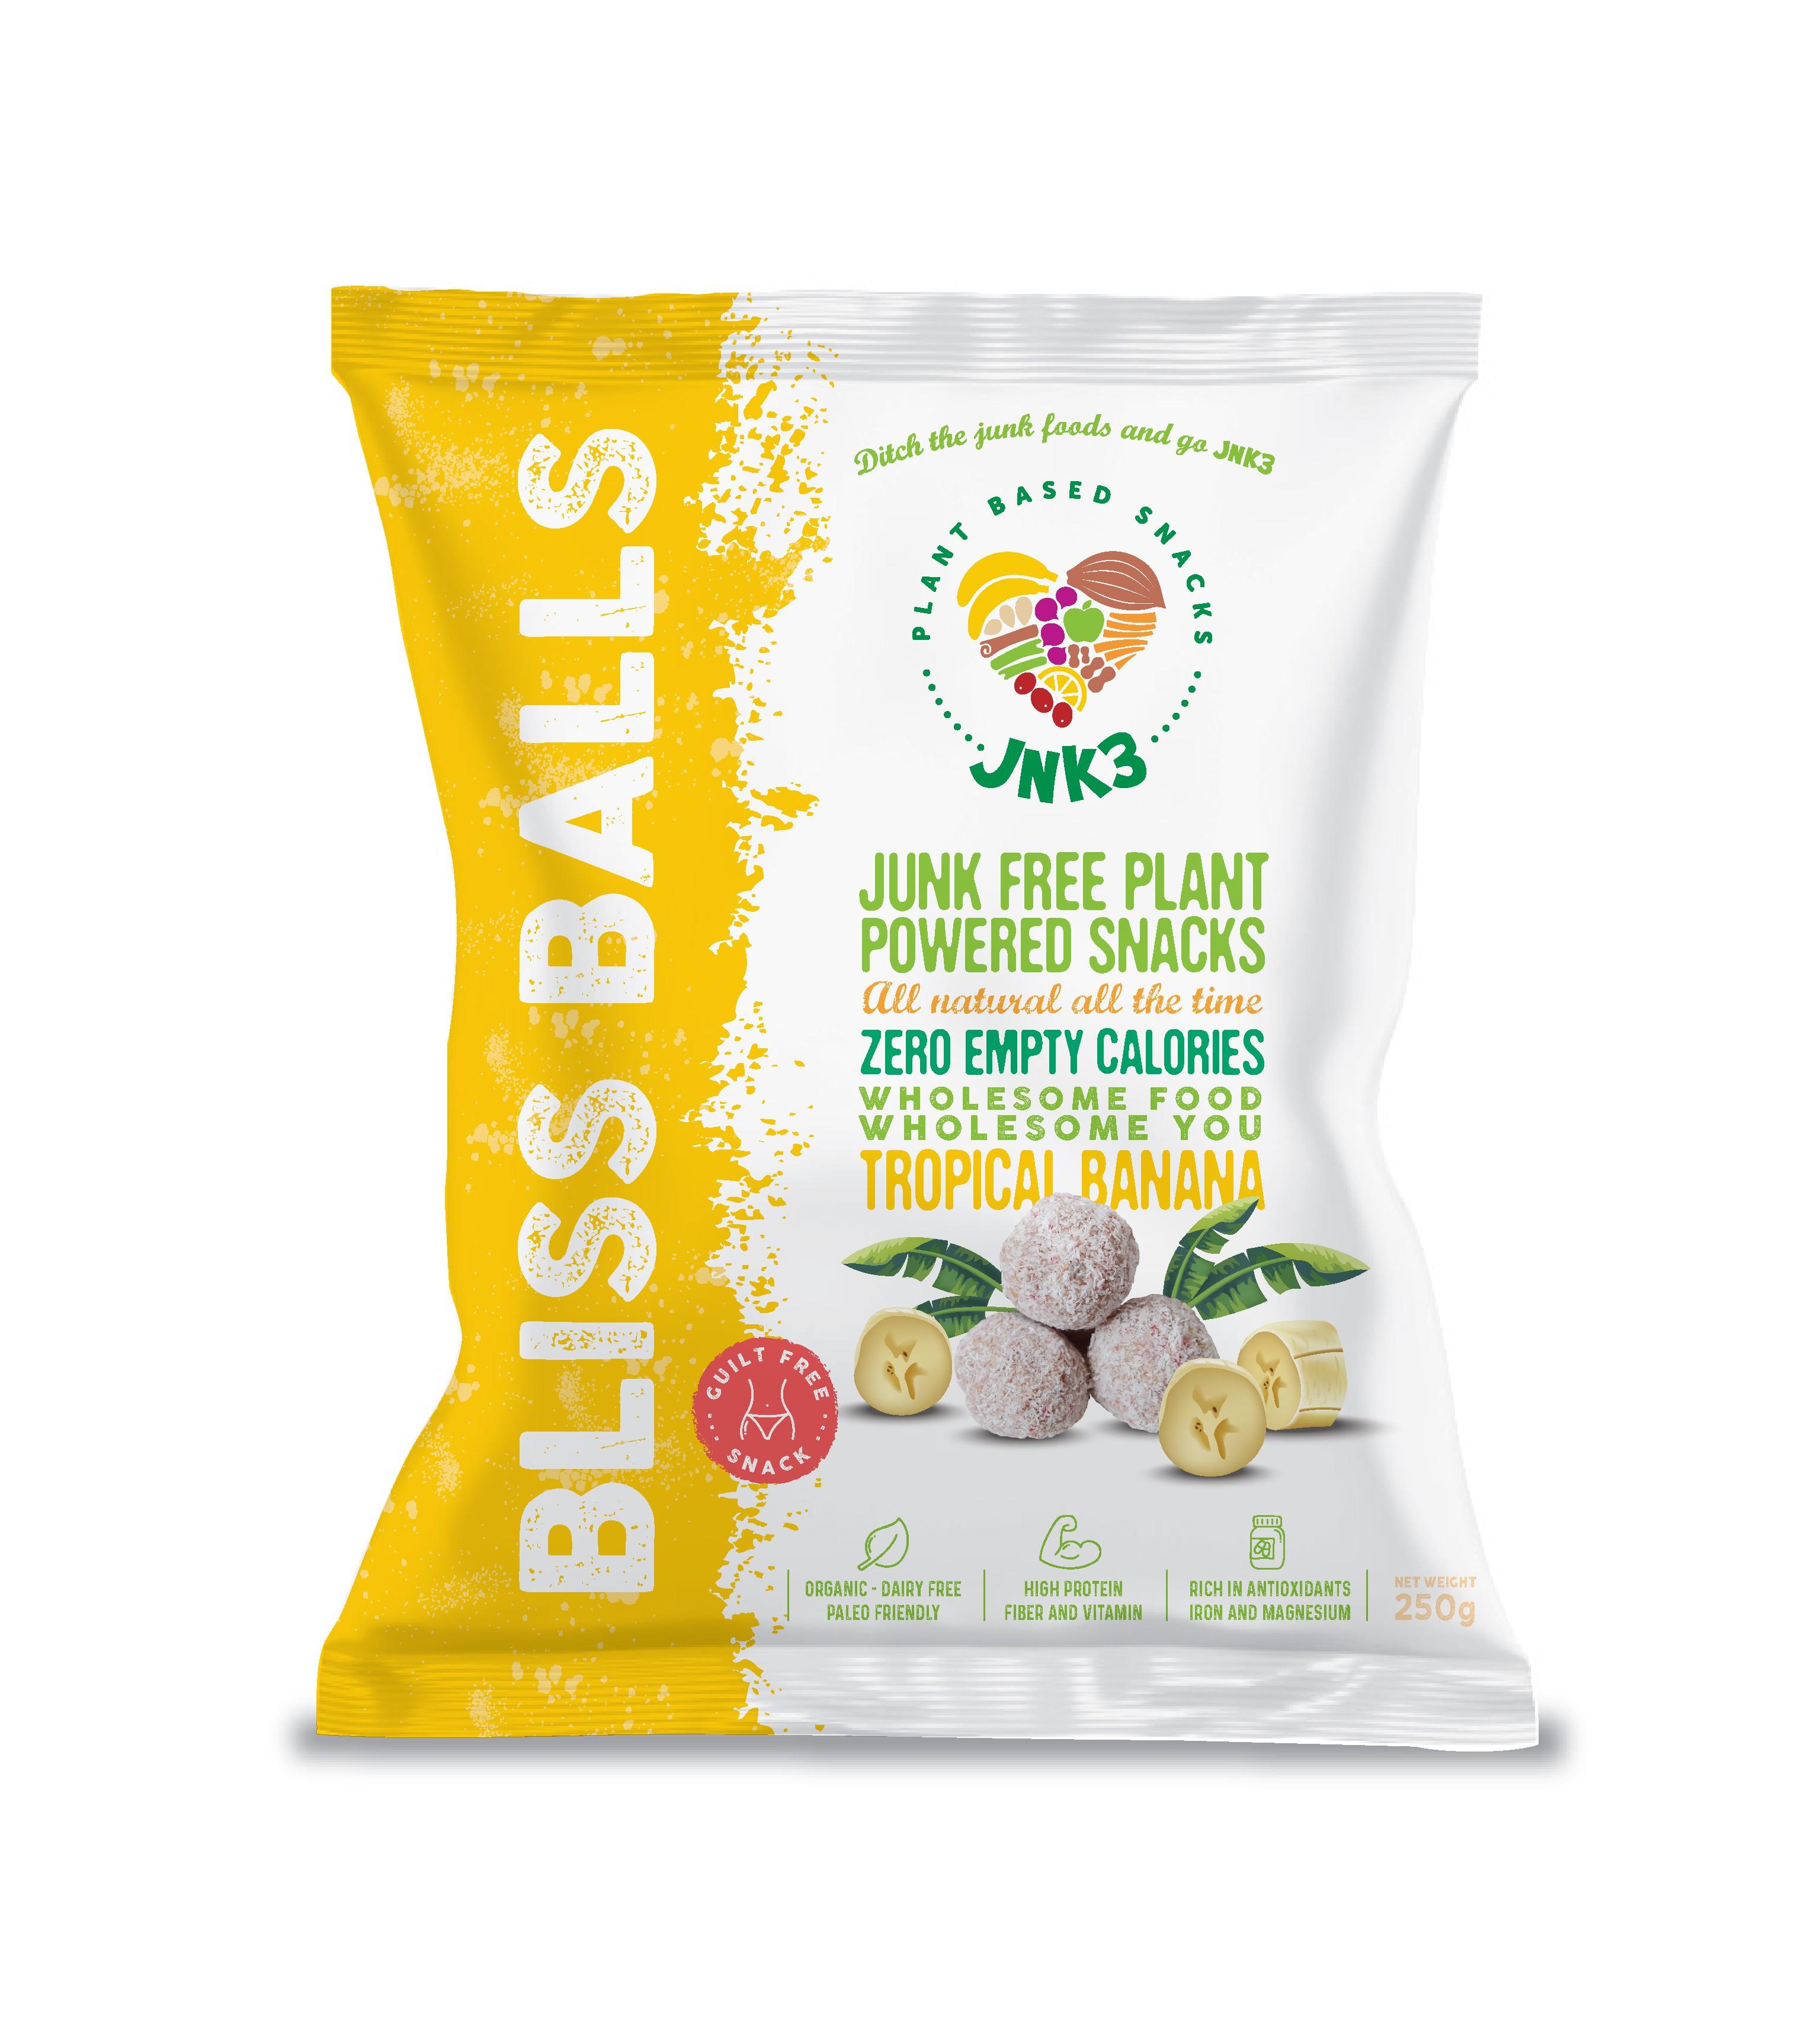 Jnk3 plant based snacks